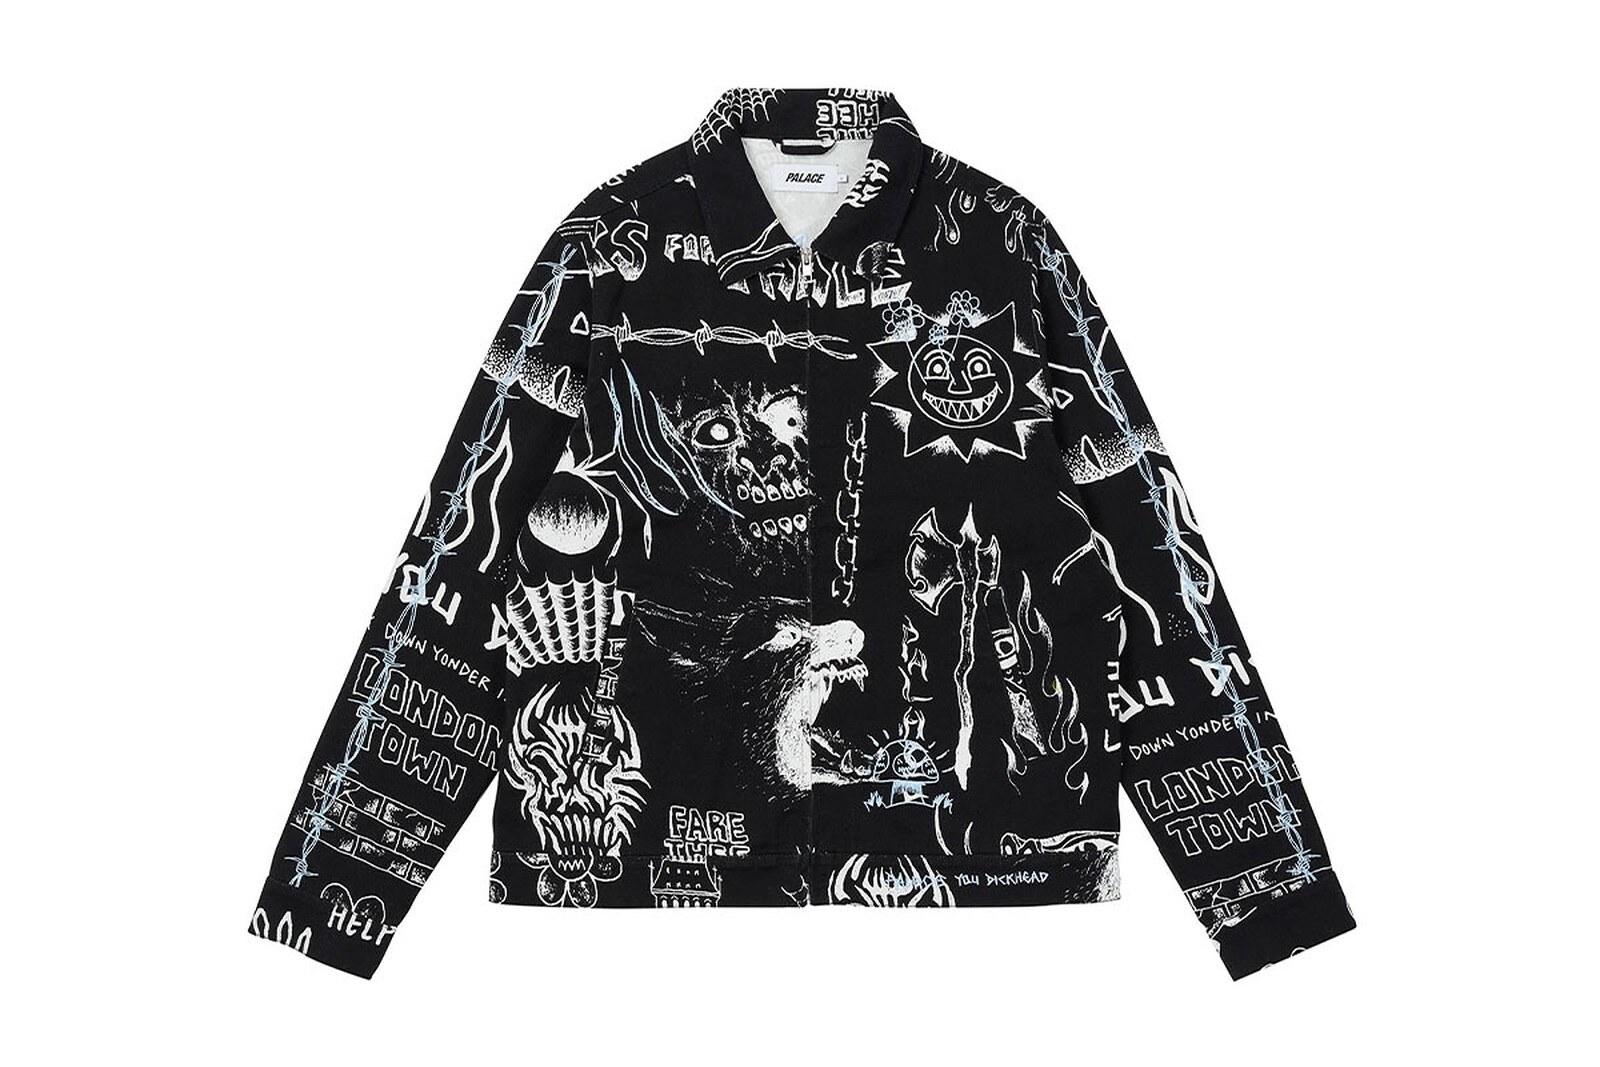 Palace x Lotties jacket